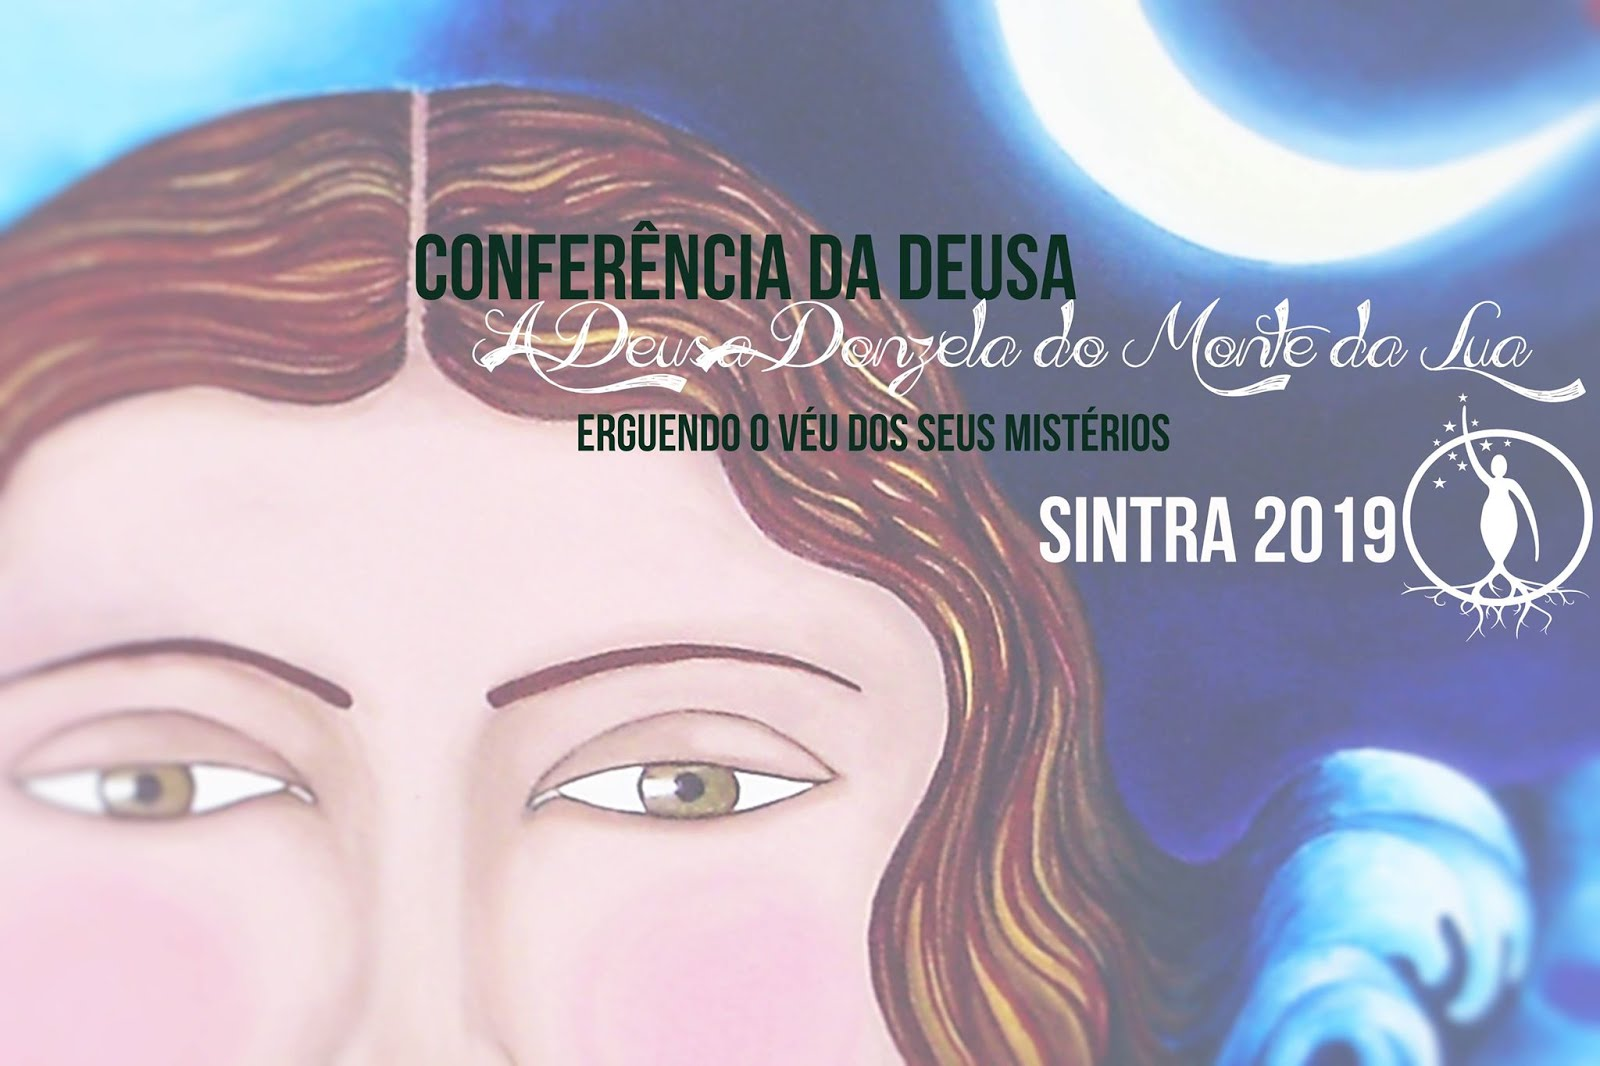 CONFERÊNCIA DA DEUSA PORTUGAL 2019